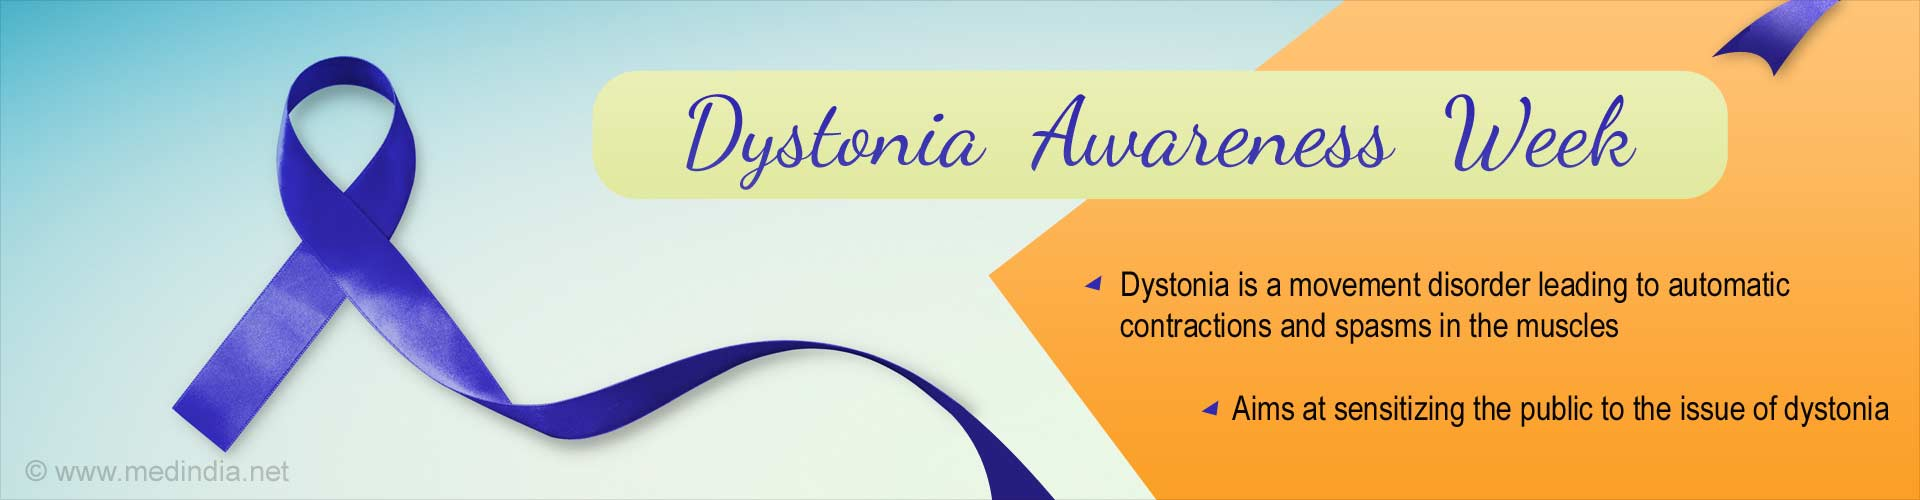 Dystonia Awareness Week